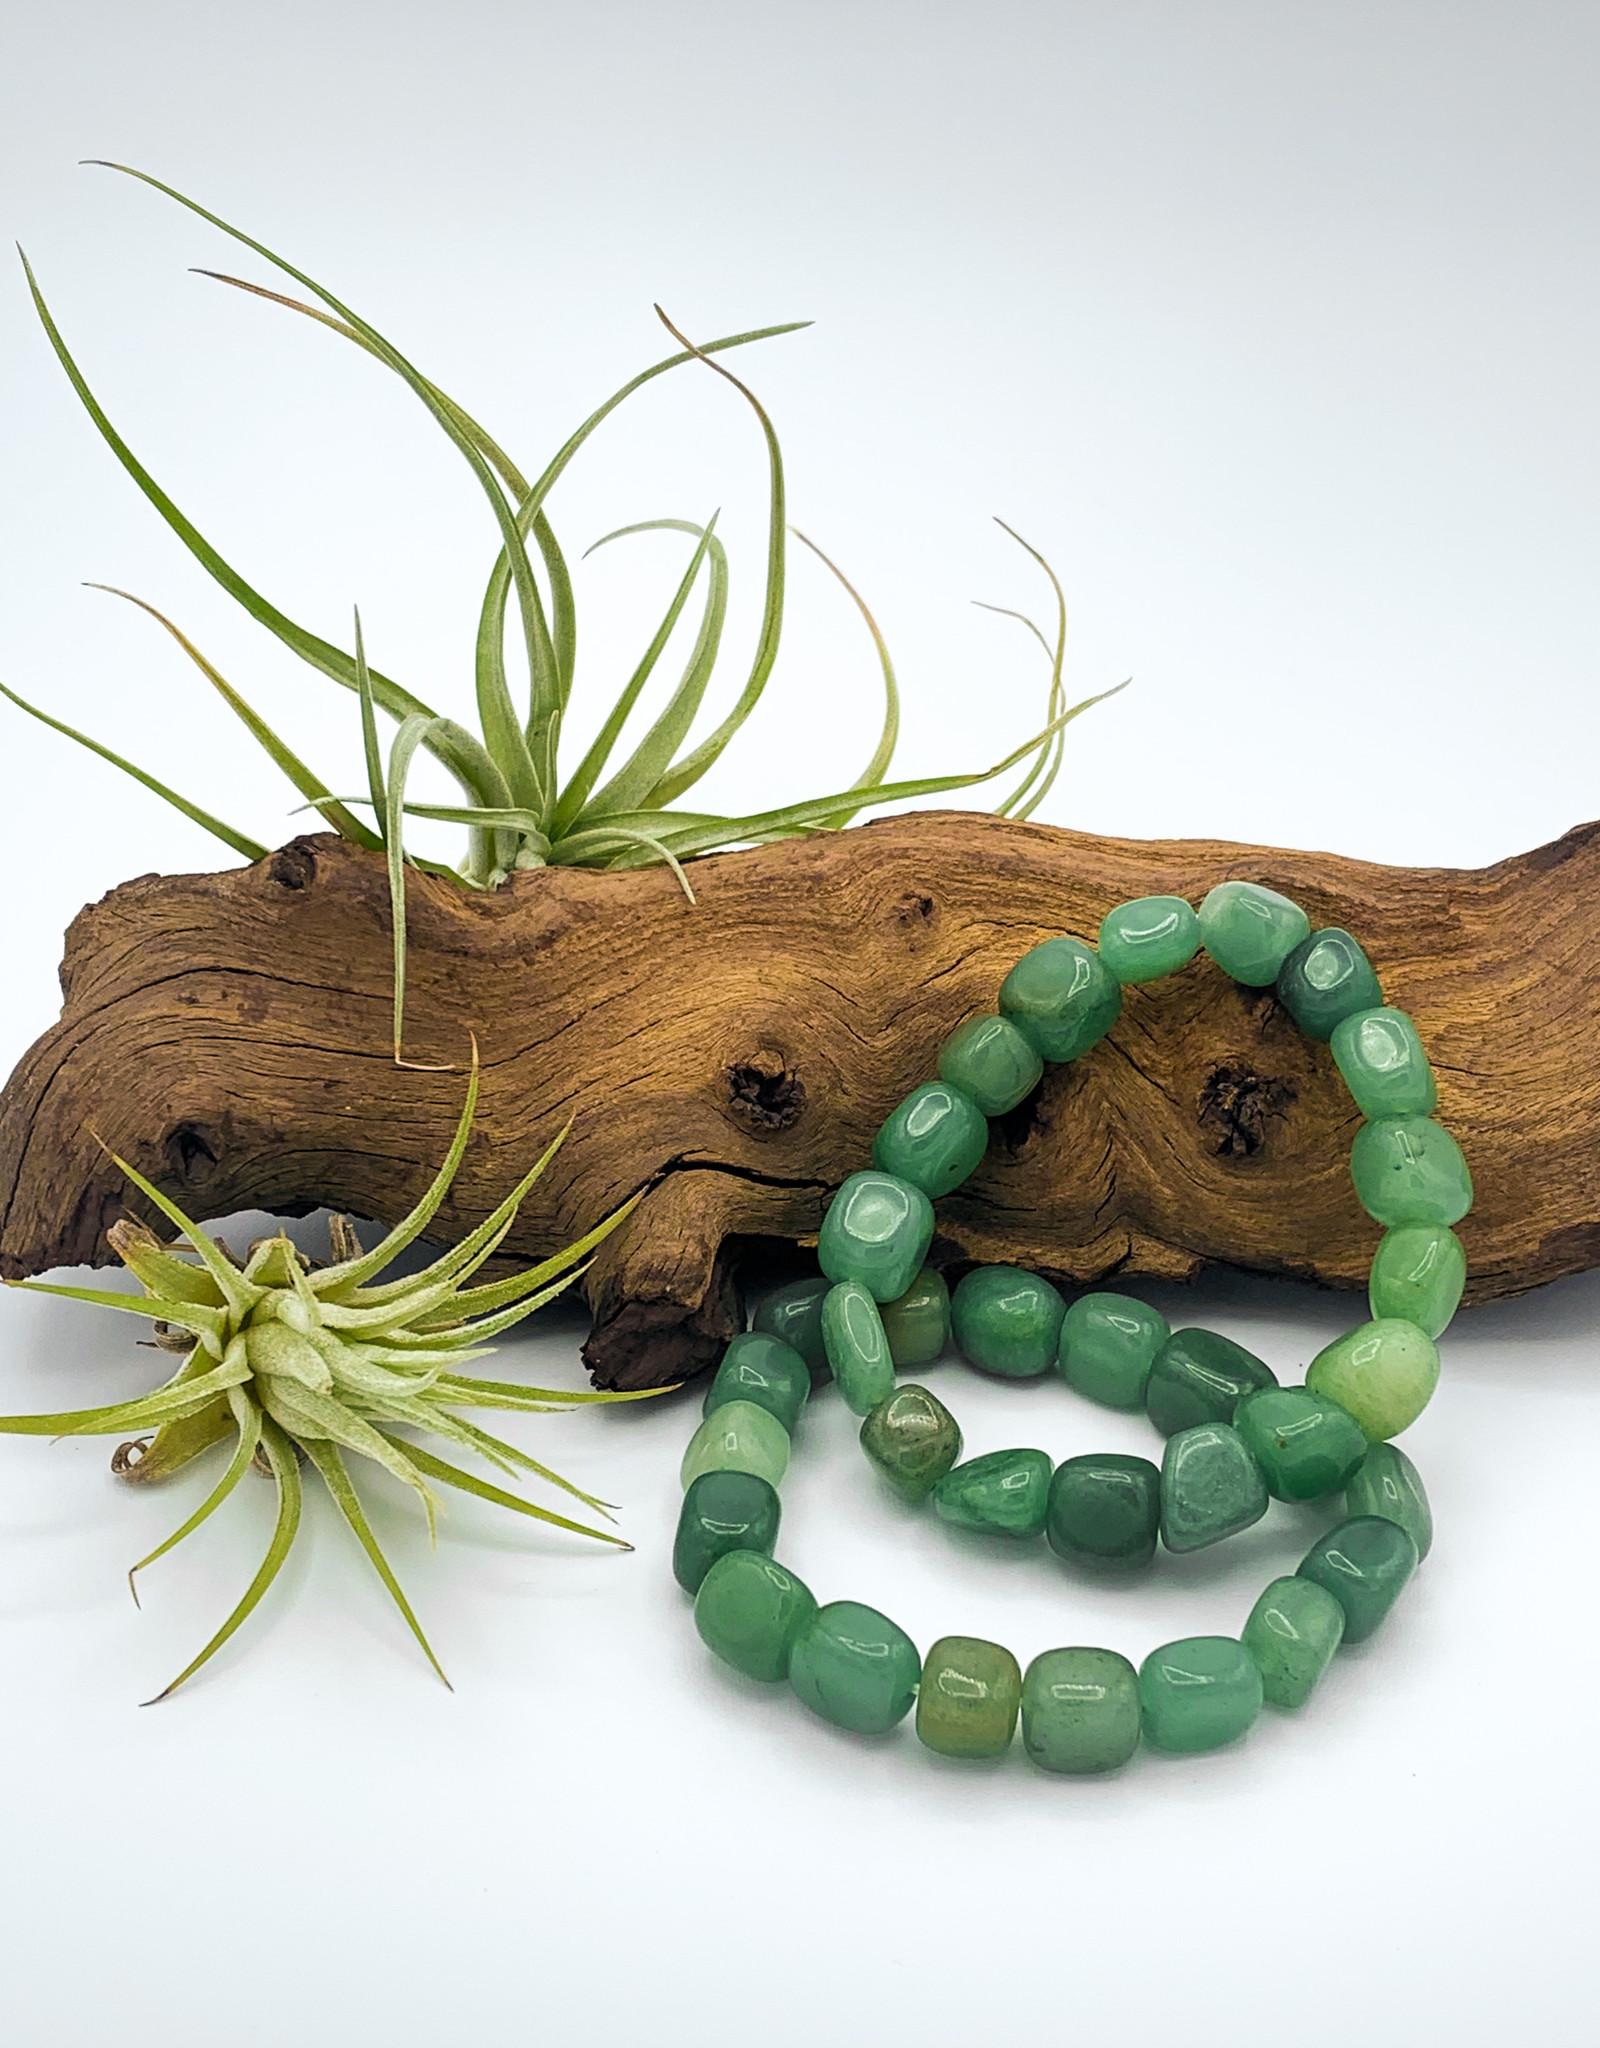 Green Aventurine Tumbled Gemstone Bracelet